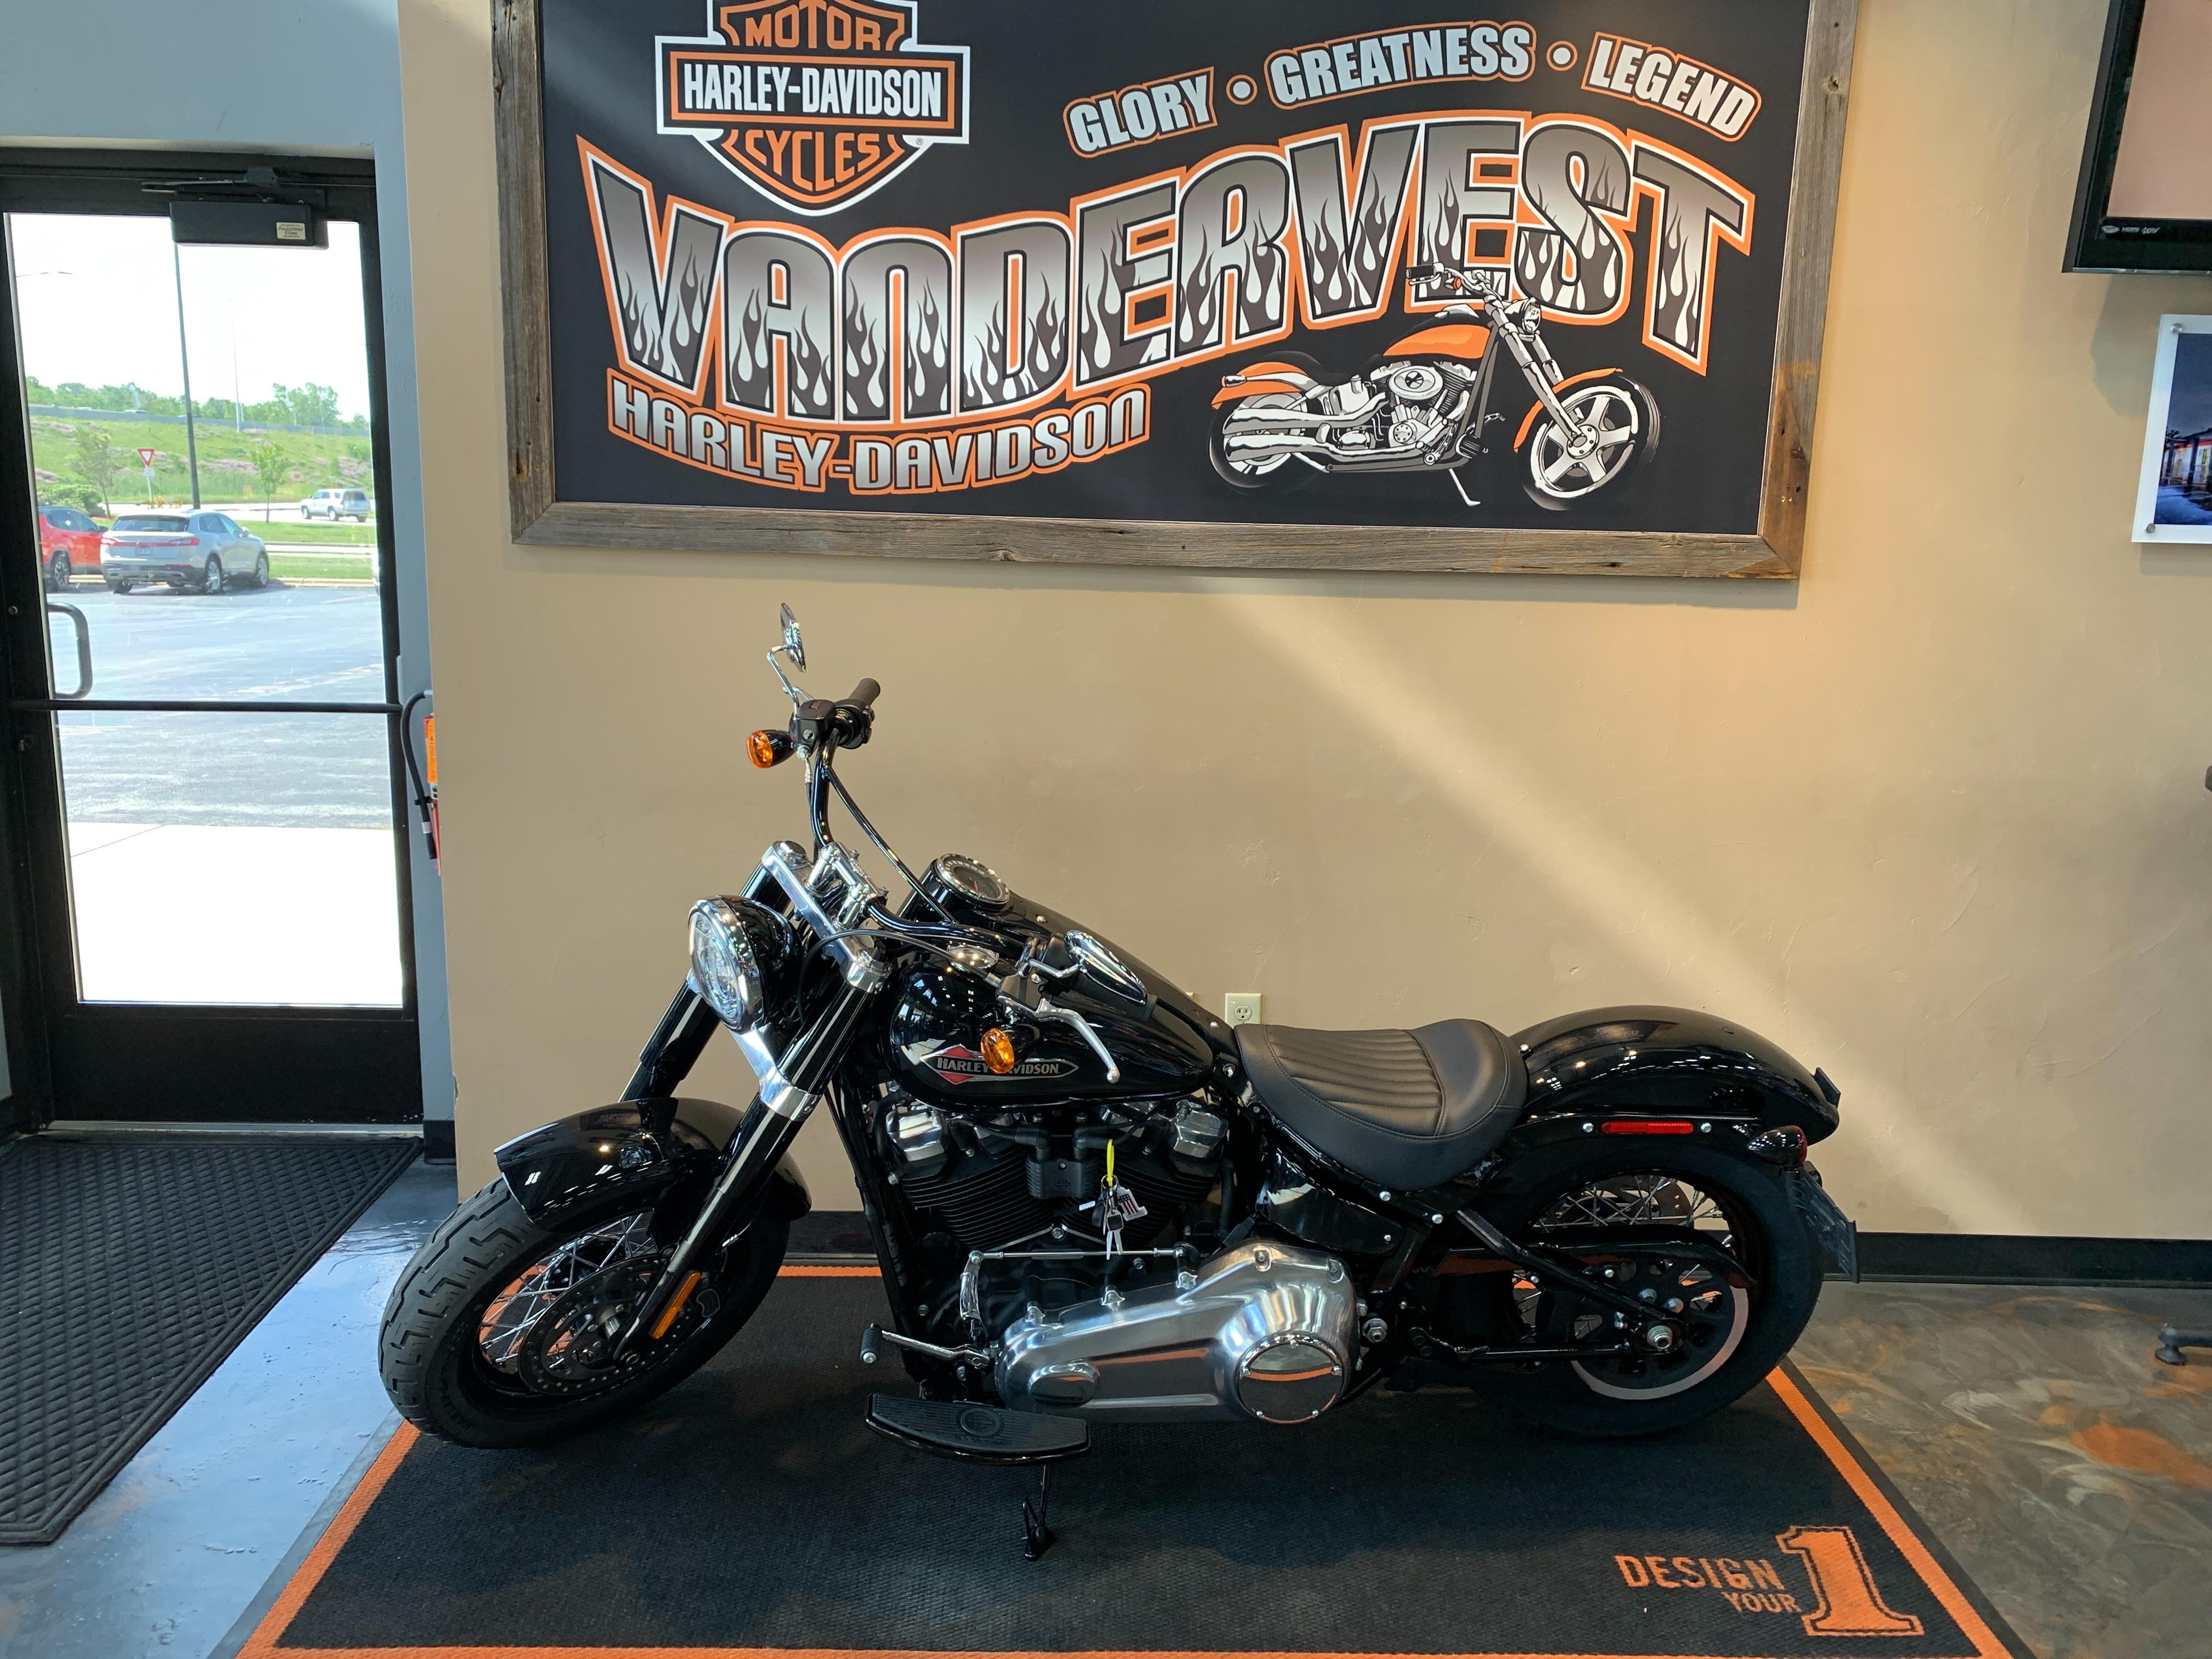 2021 Harley-Davidson Cruiser Softail Slim at Vandervest Harley-Davidson, Green Bay, WI 54303